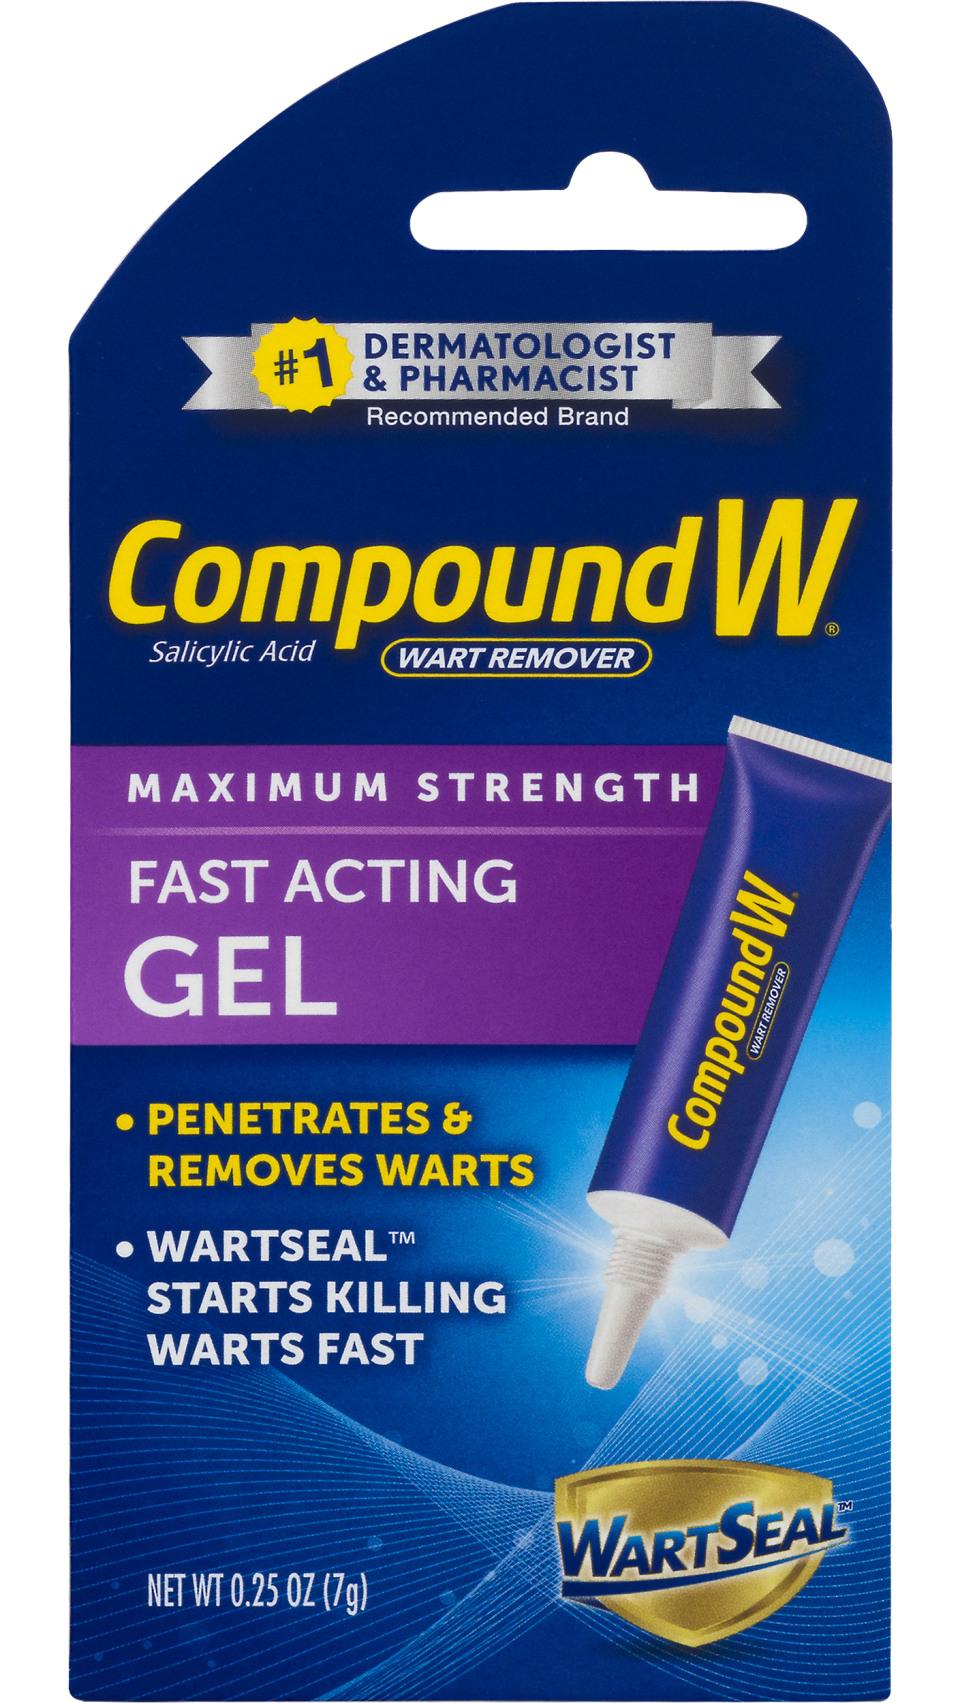 genital wart cream at walmart